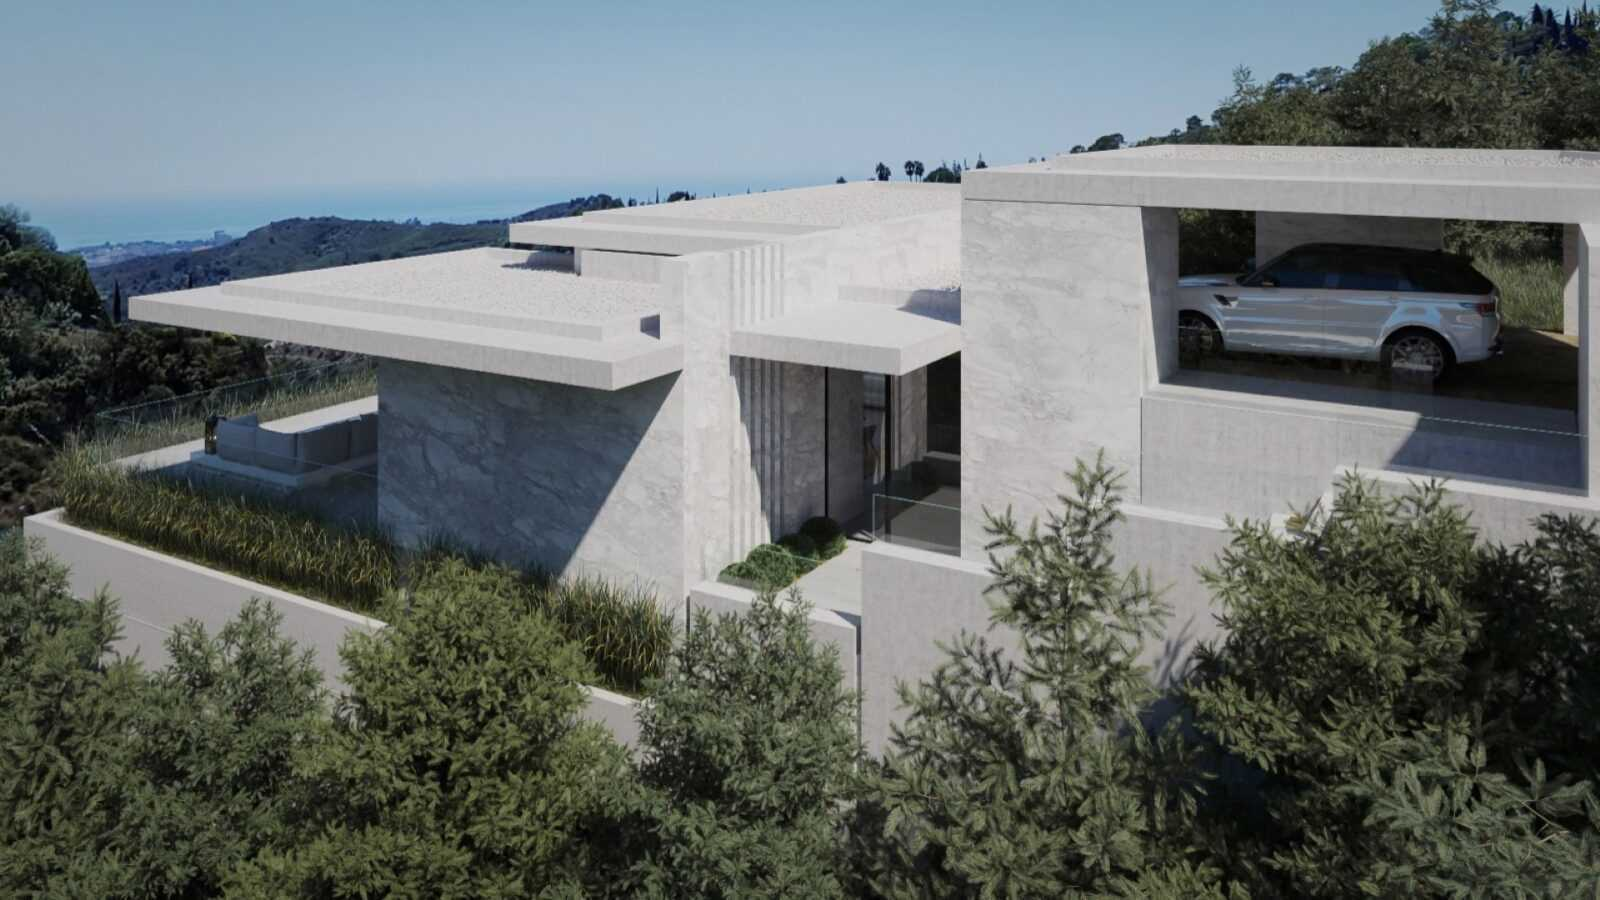 PHOTO 2020 04 16 20 01 37 3 Large Virtualport3d luxury Properties in Marbella and Costa del Sol